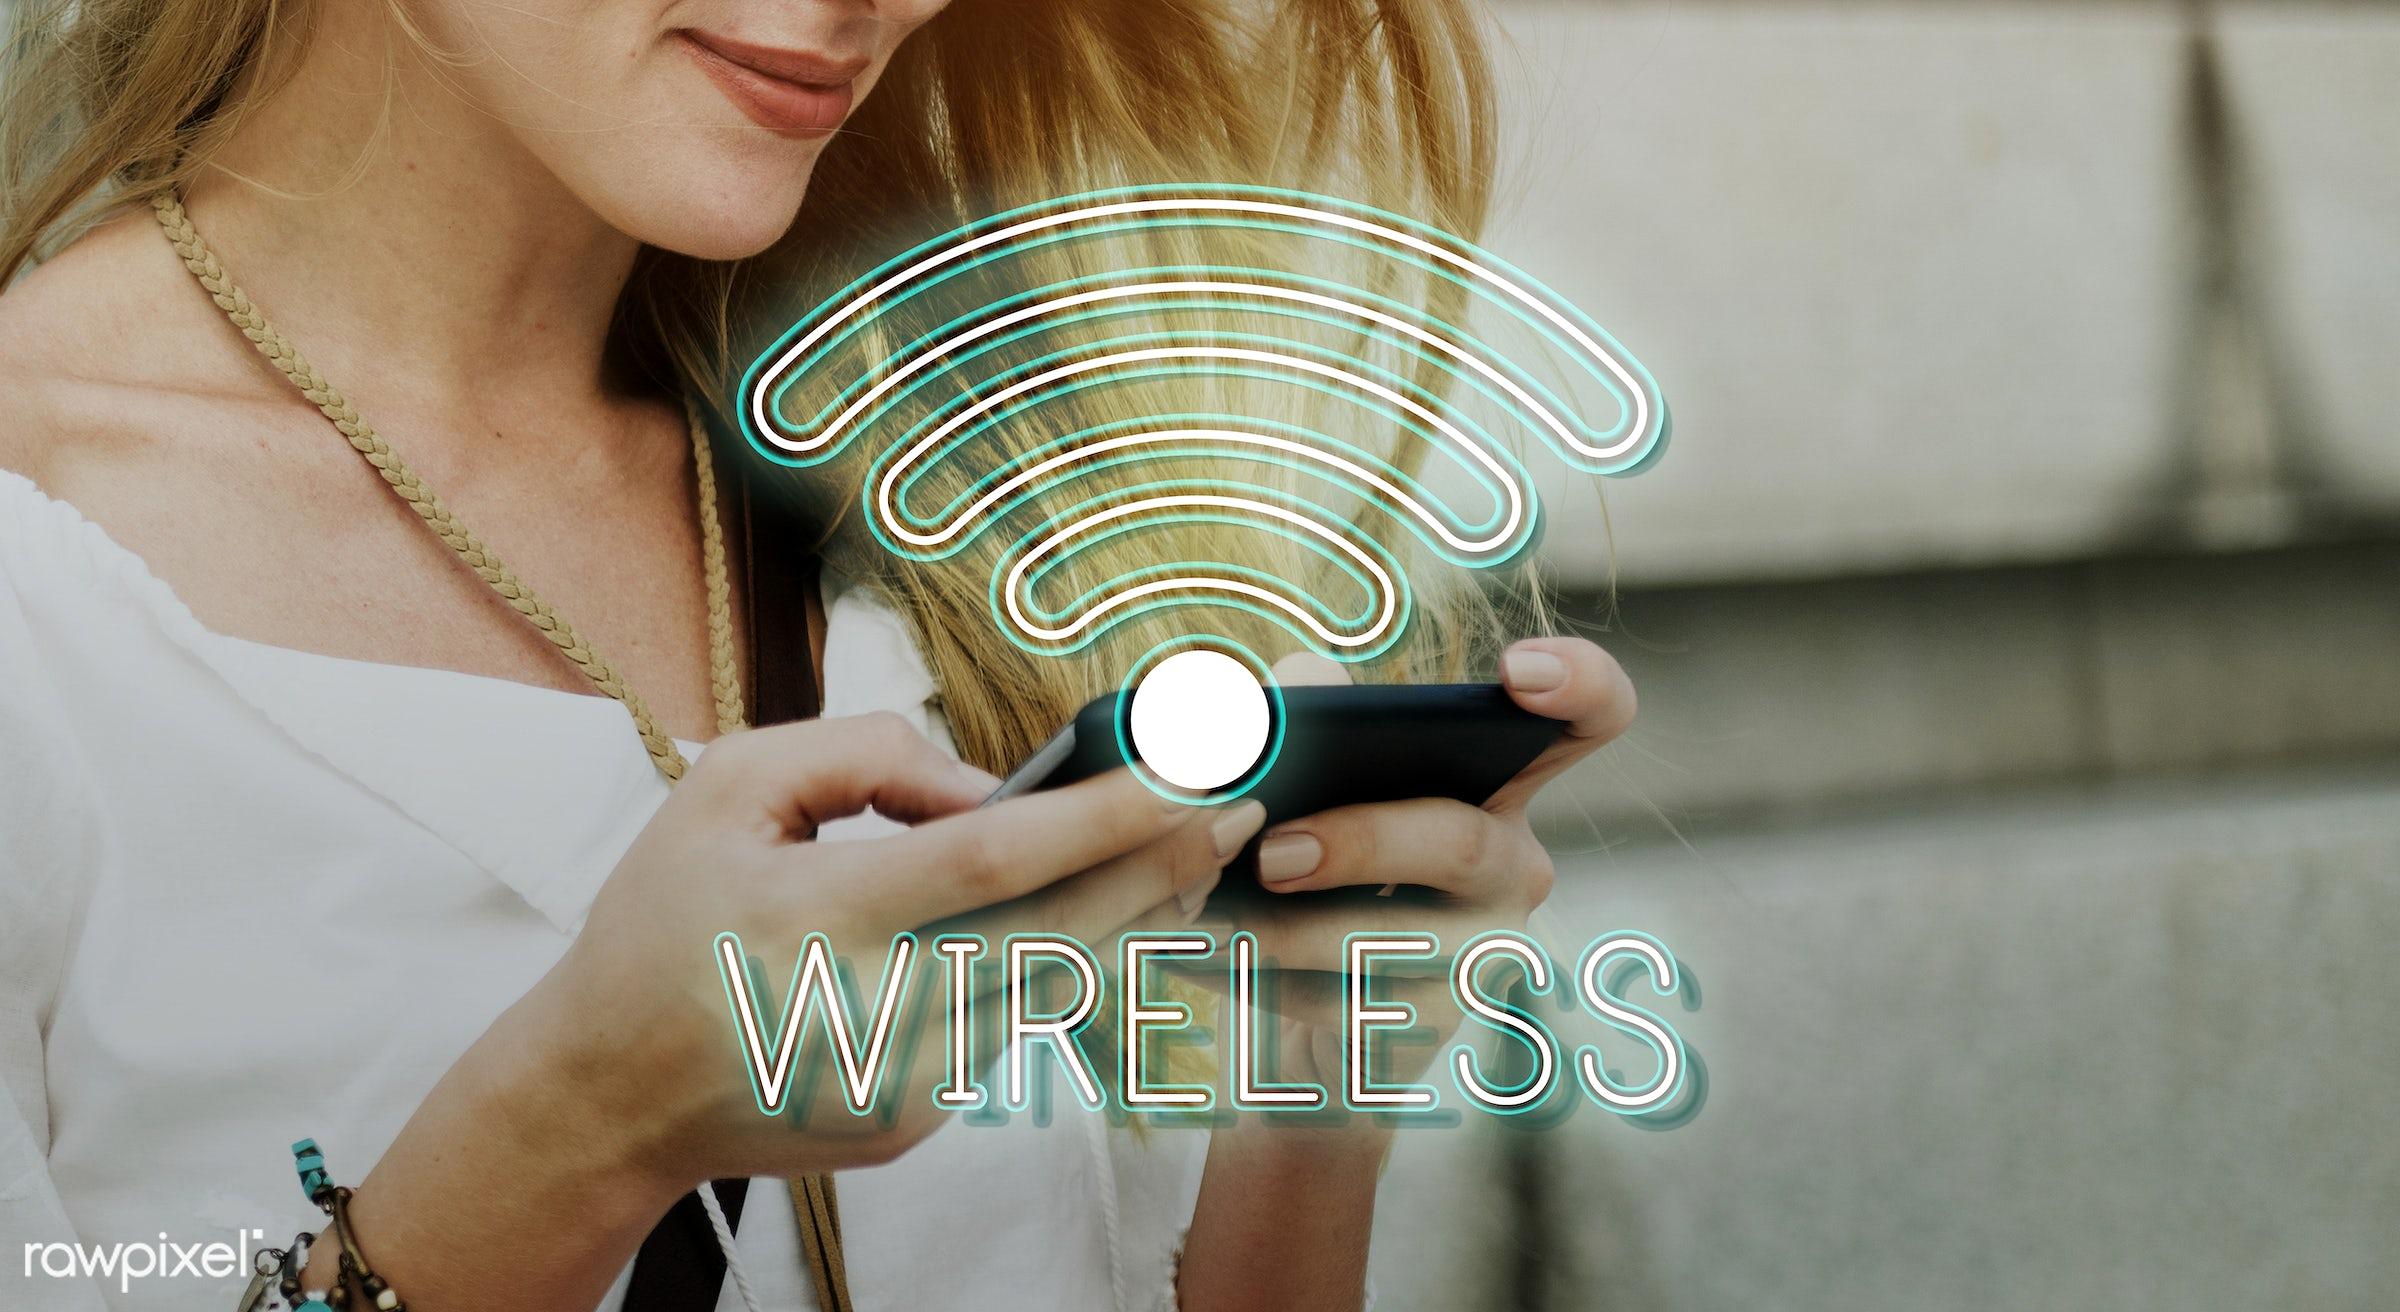 browsing, chat, communication, connection, electronic, go digital, hotspot, icon, illustration, internet, leisure, media,...